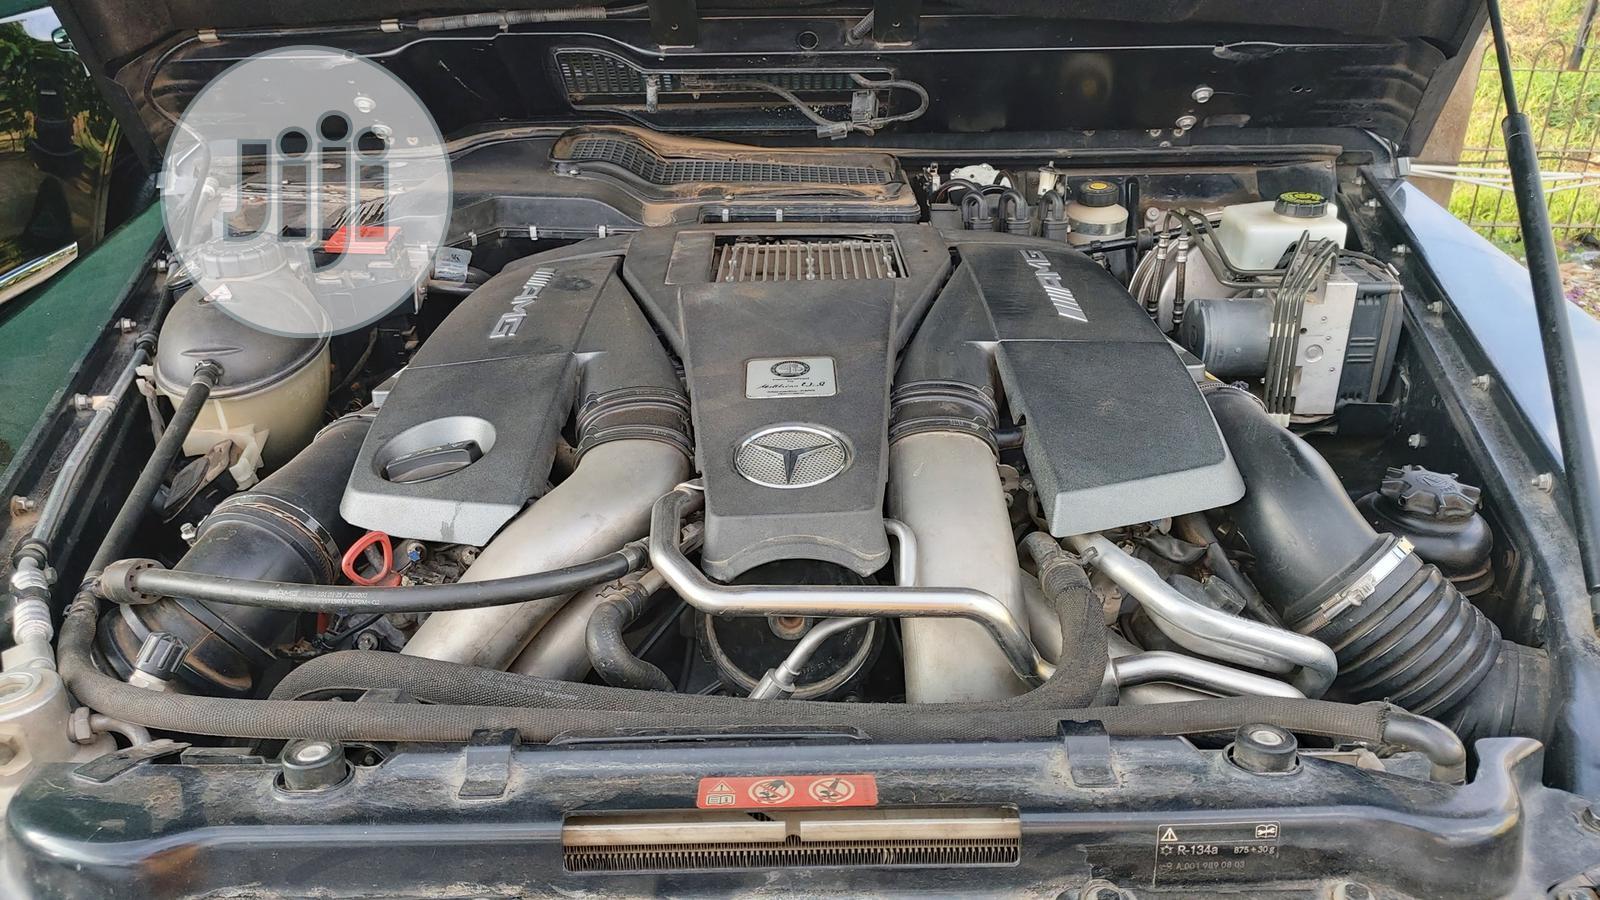 Archive: Mercedes-Benz G-Class 2015 Black